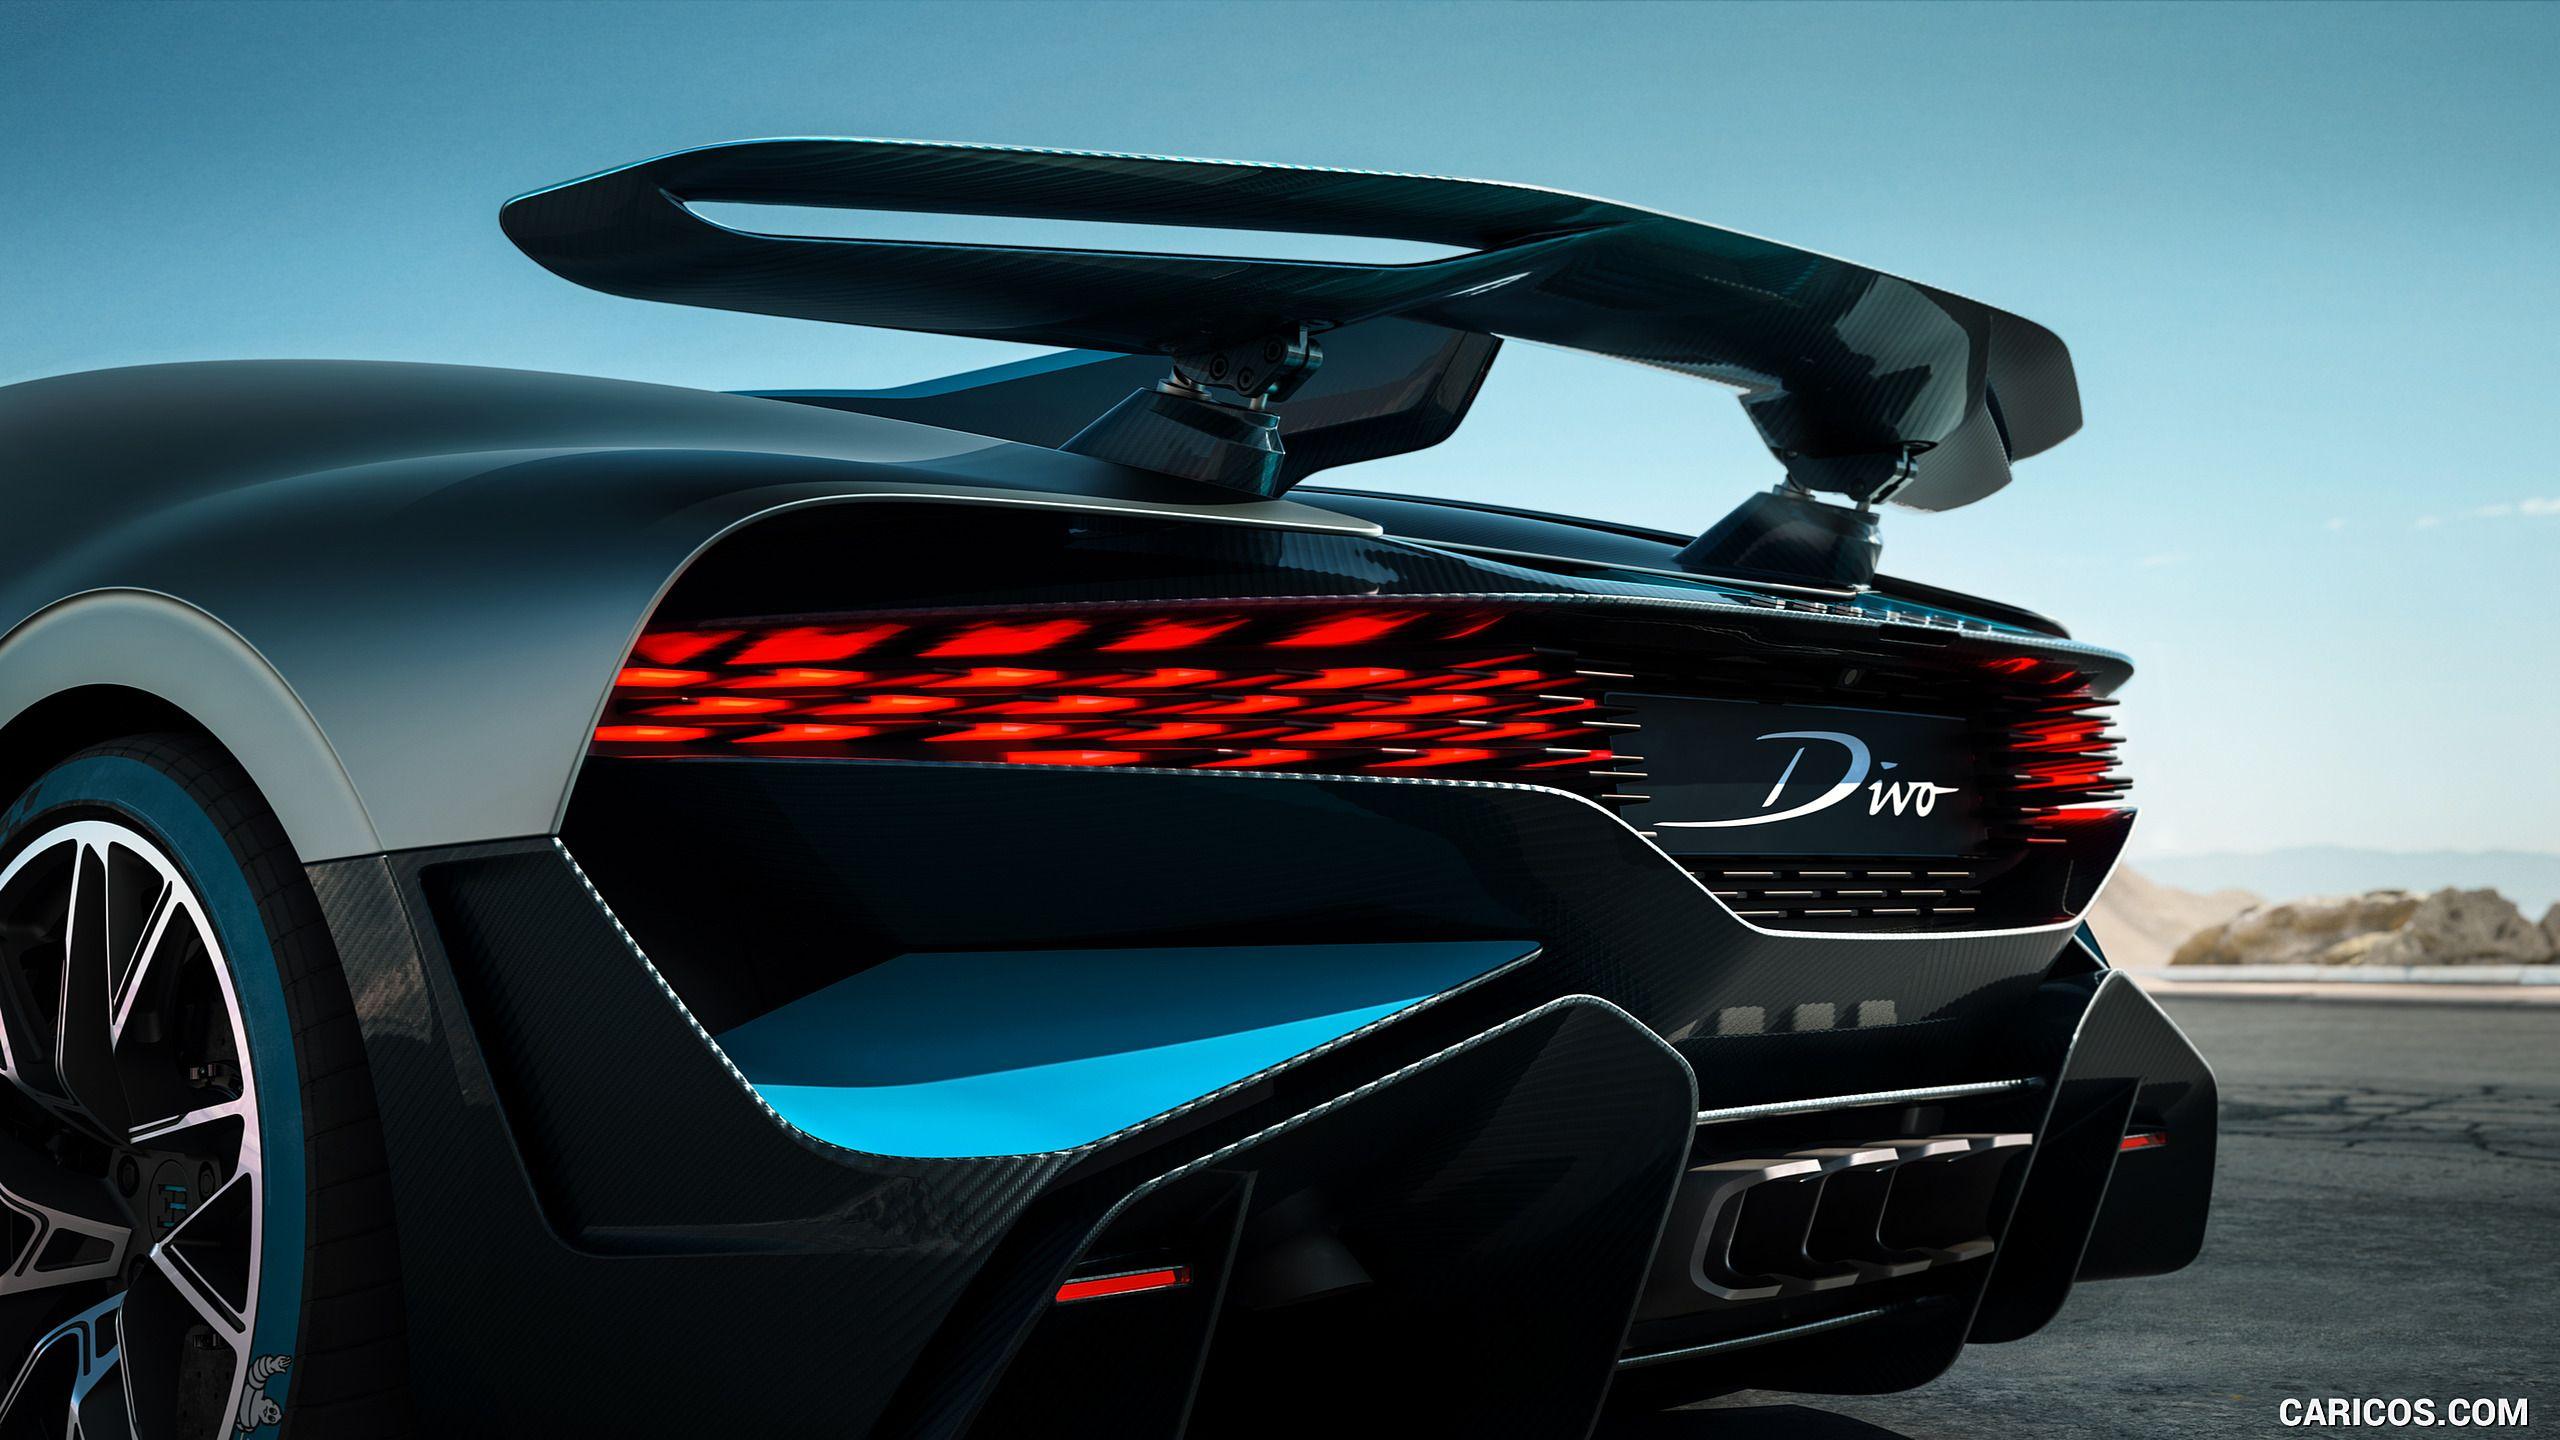 Next Stop Pinterest Sports Car Bugatti Super Cars